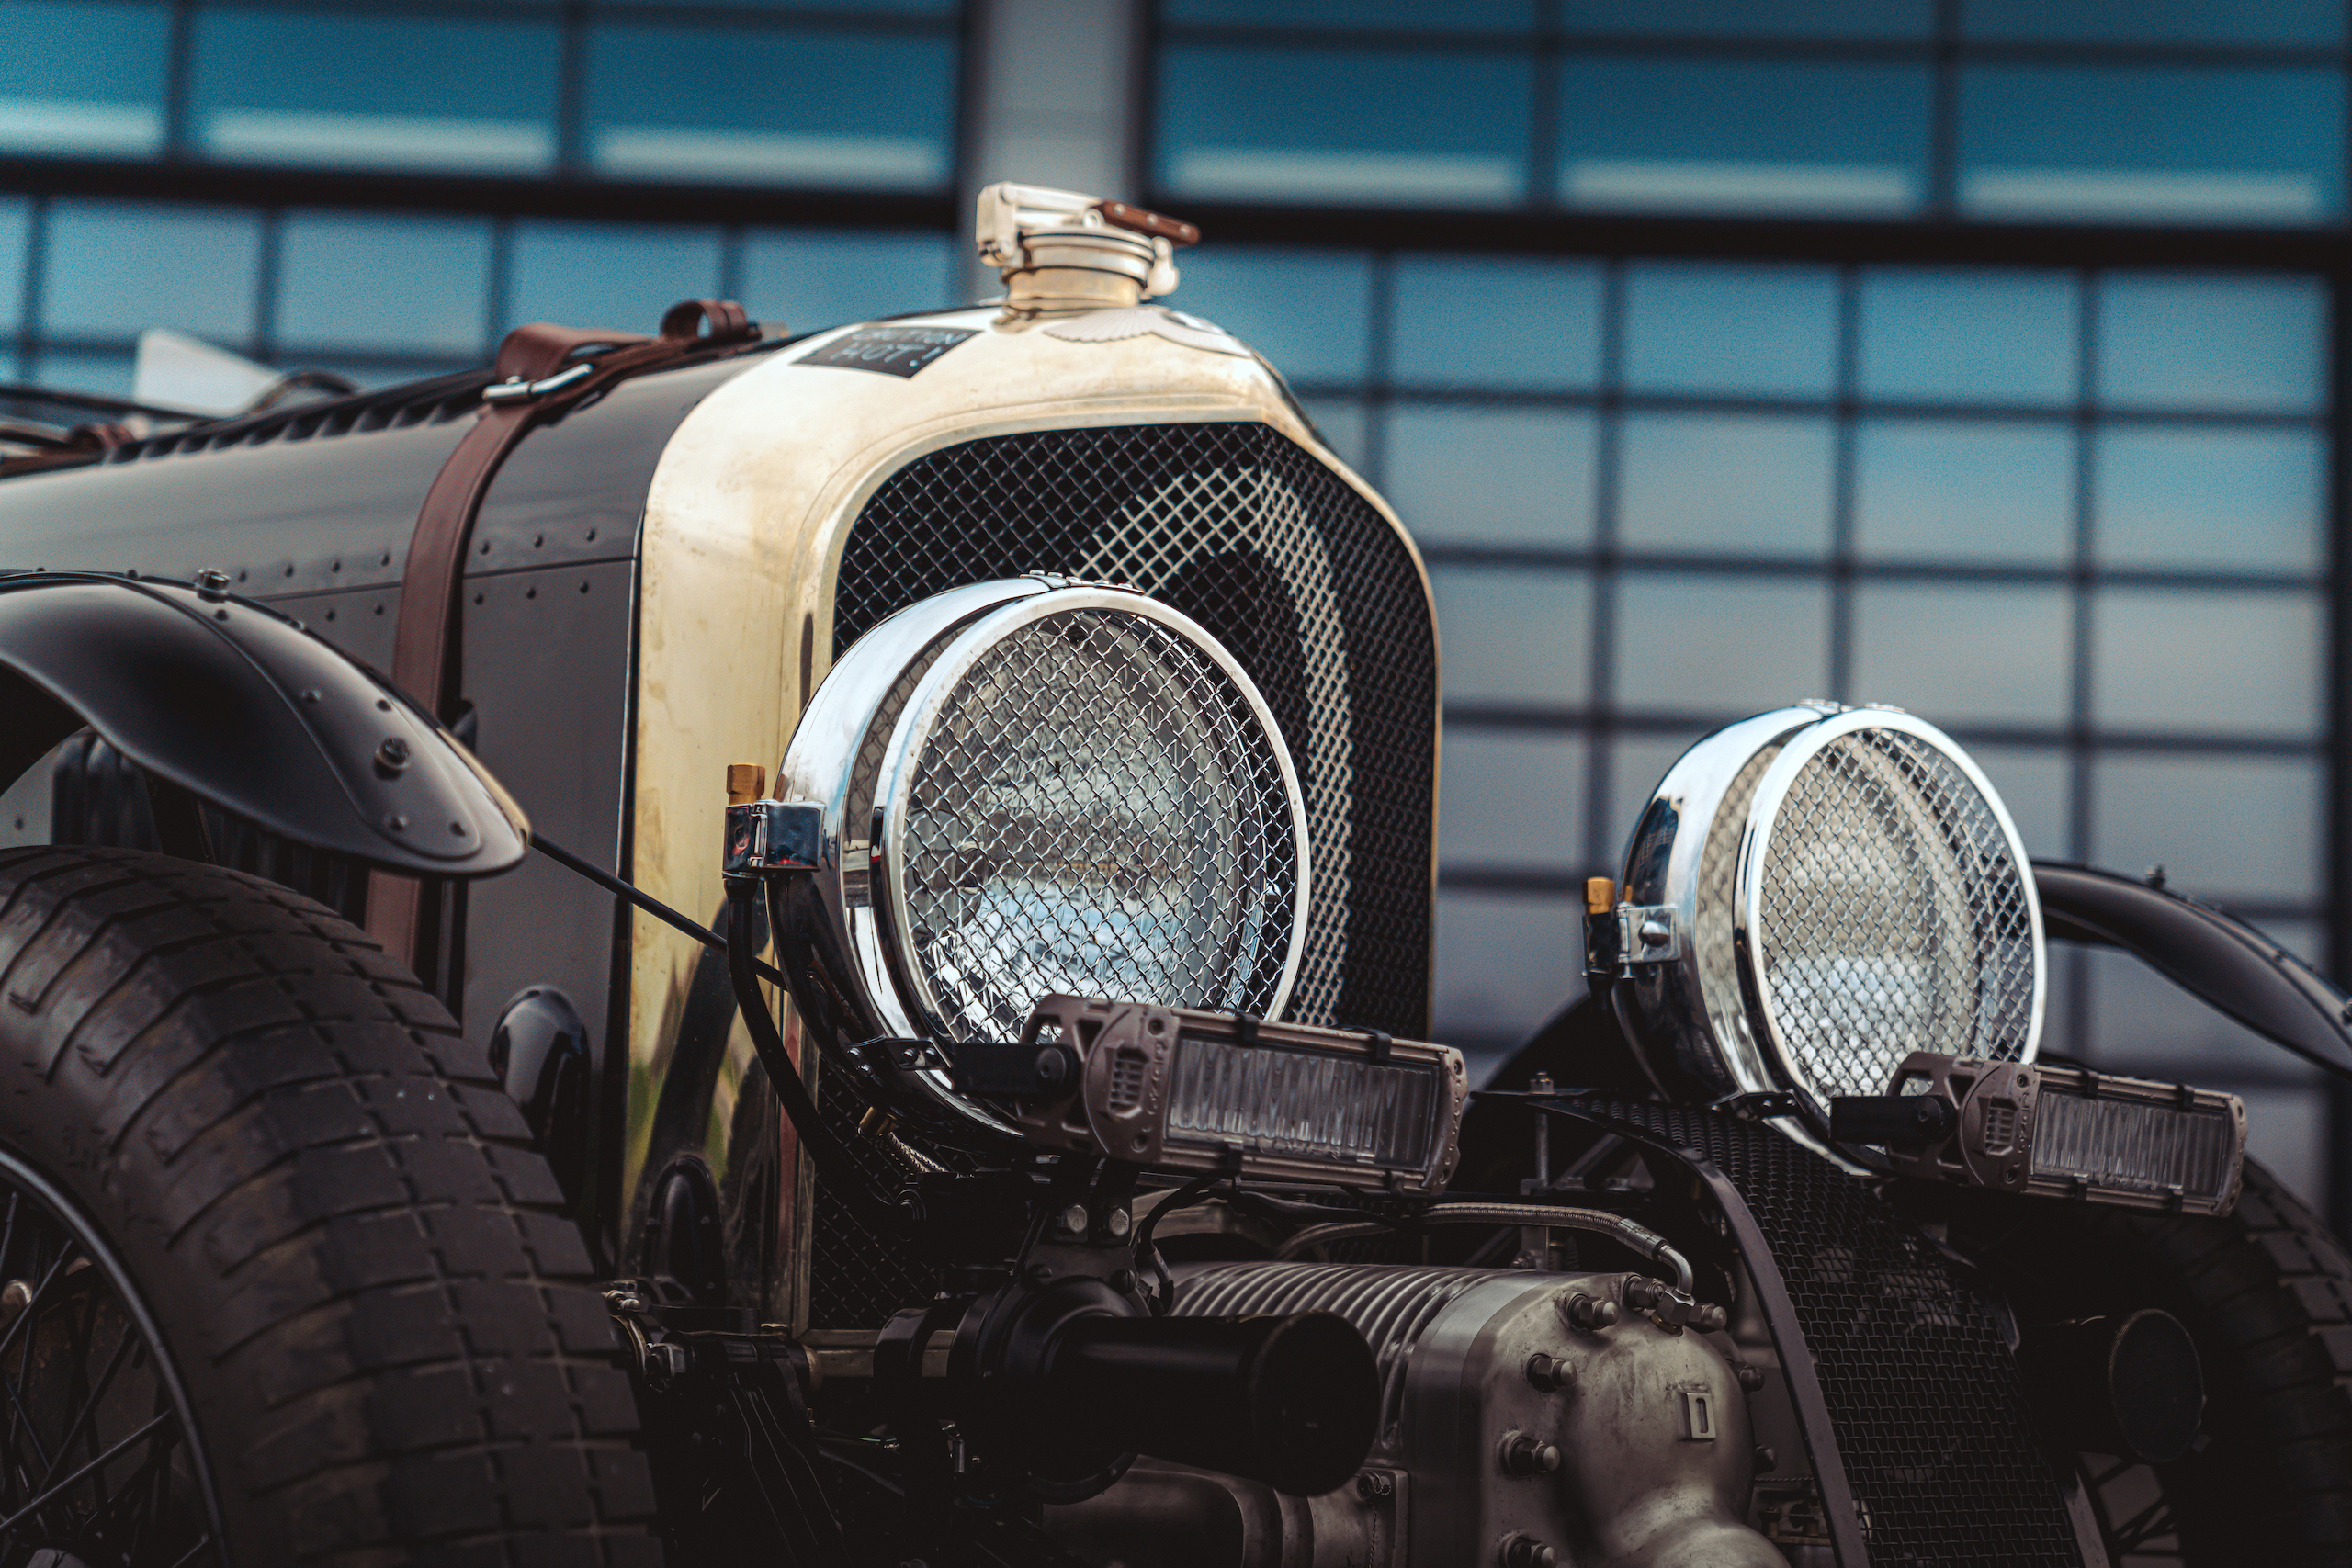 Blower Bentley front detail